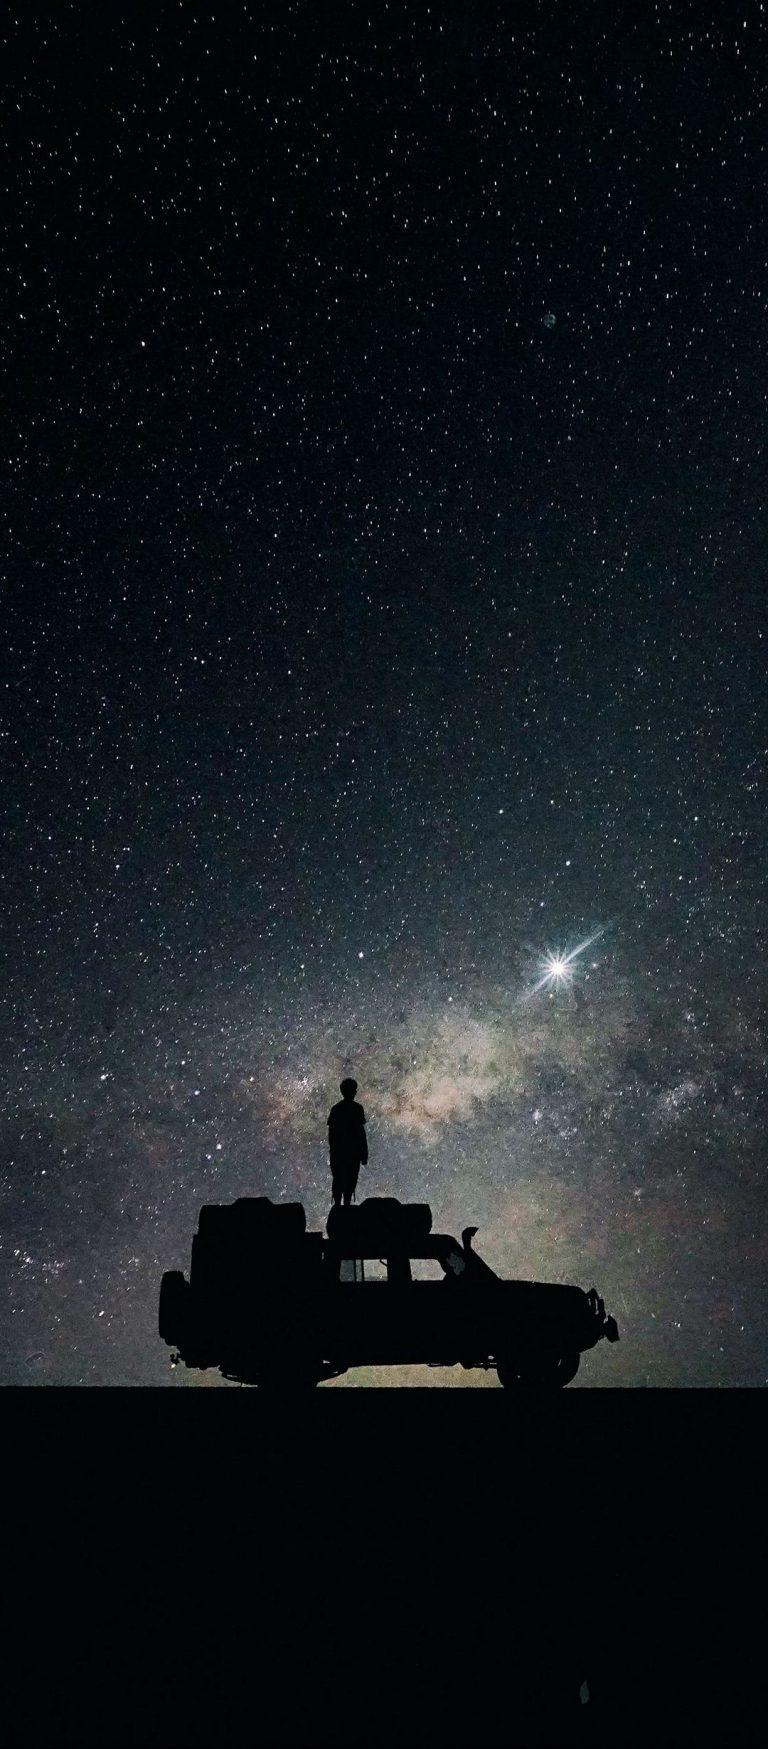 Stars Sky Space Car 1080x2460 768x1749